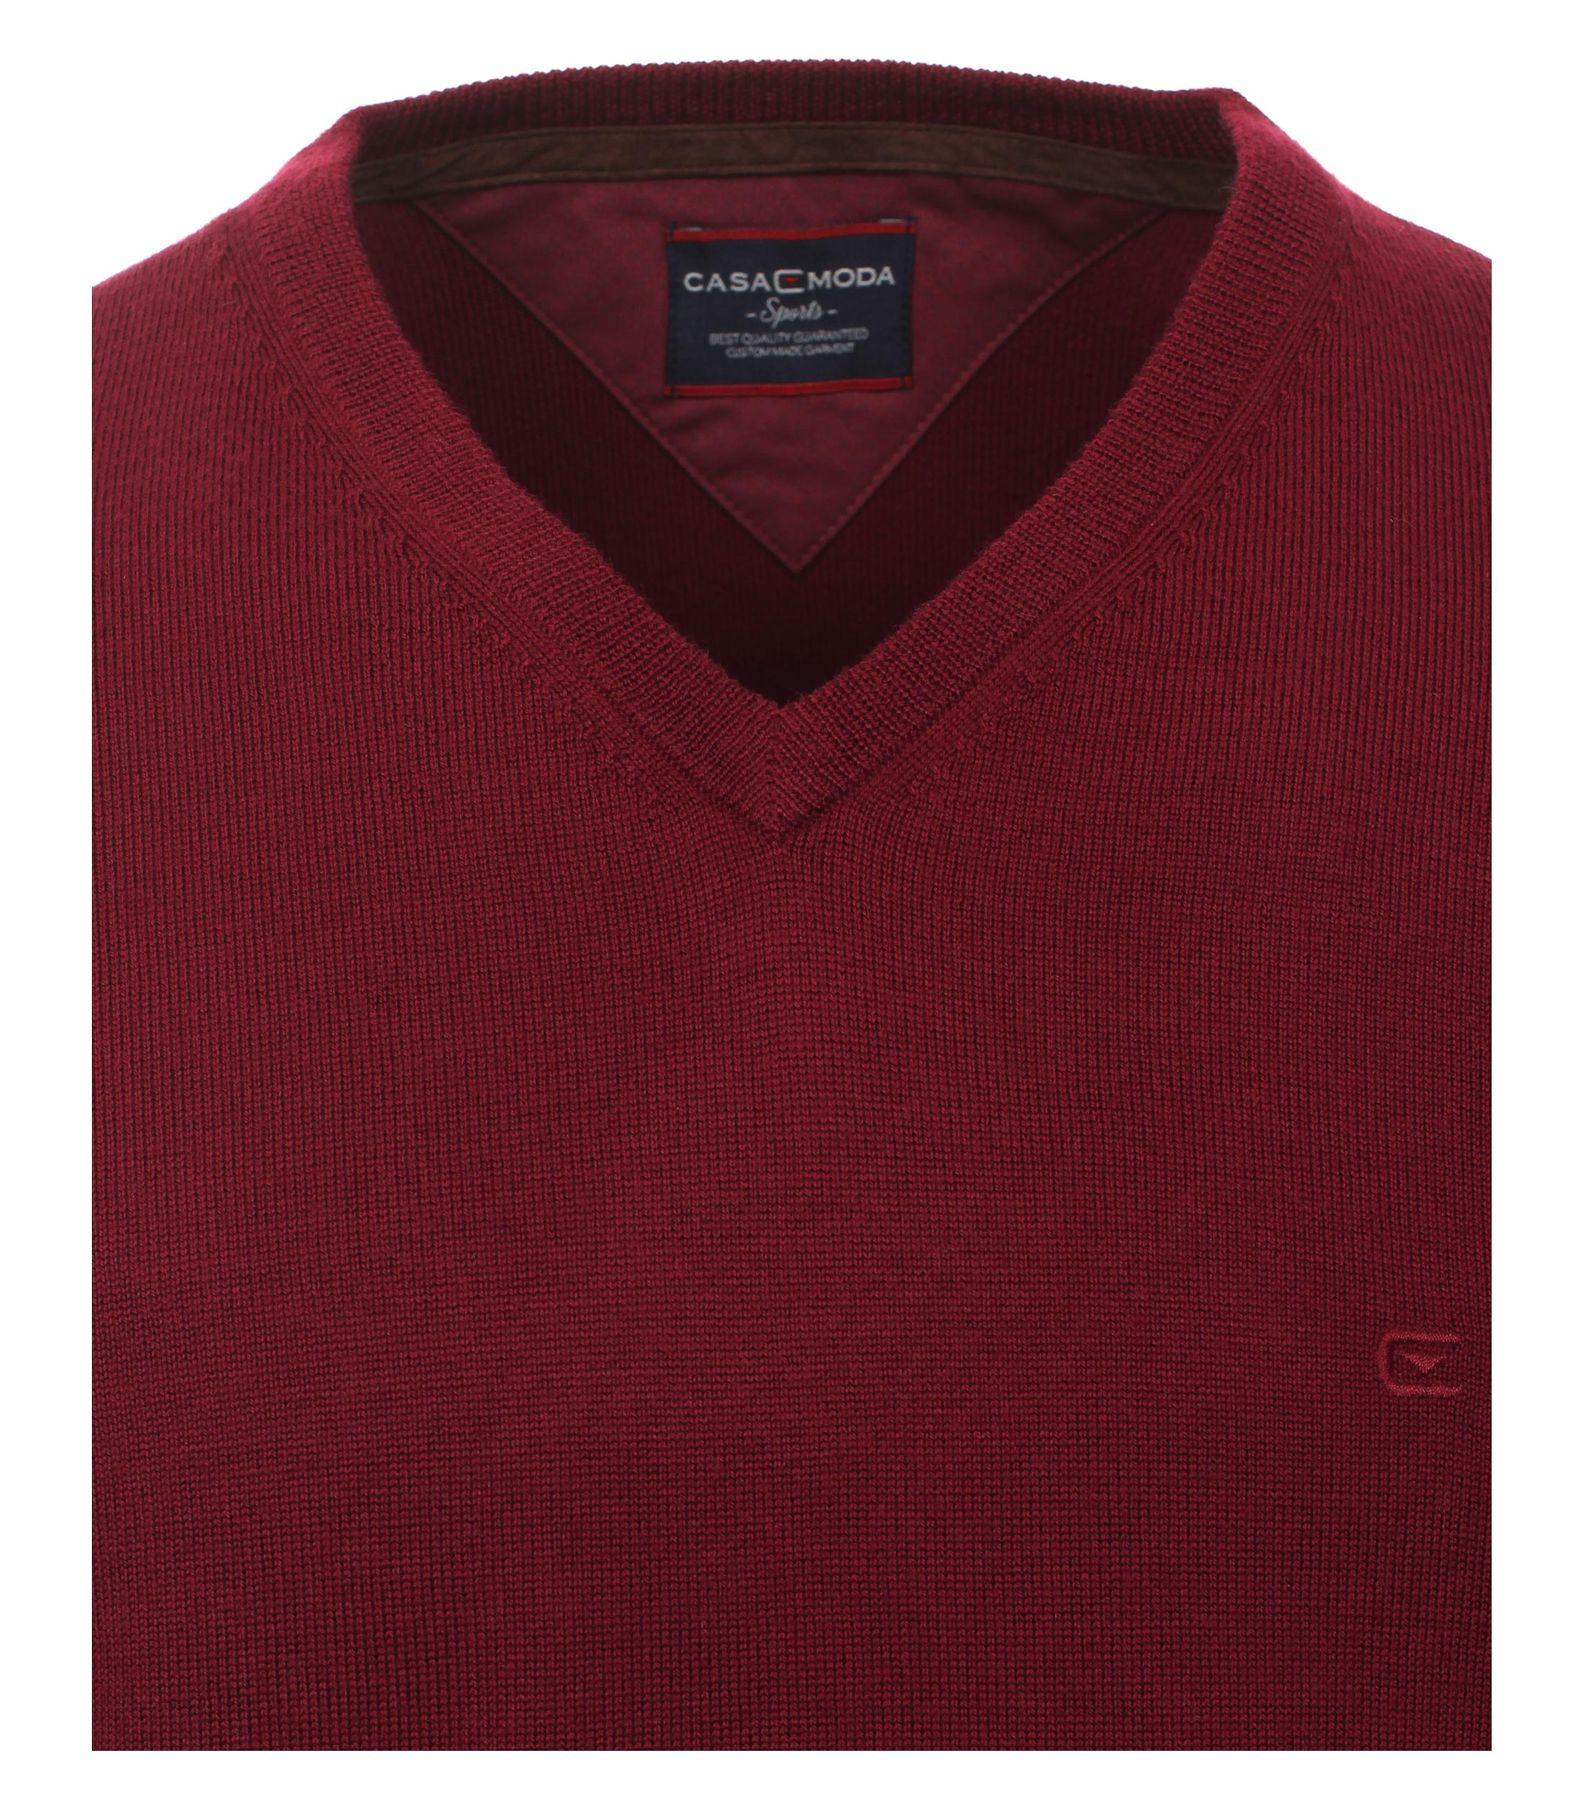 Casa Moda - Herren Merino Pullover mit V-Ausschnitt (462519900) – Bild 8